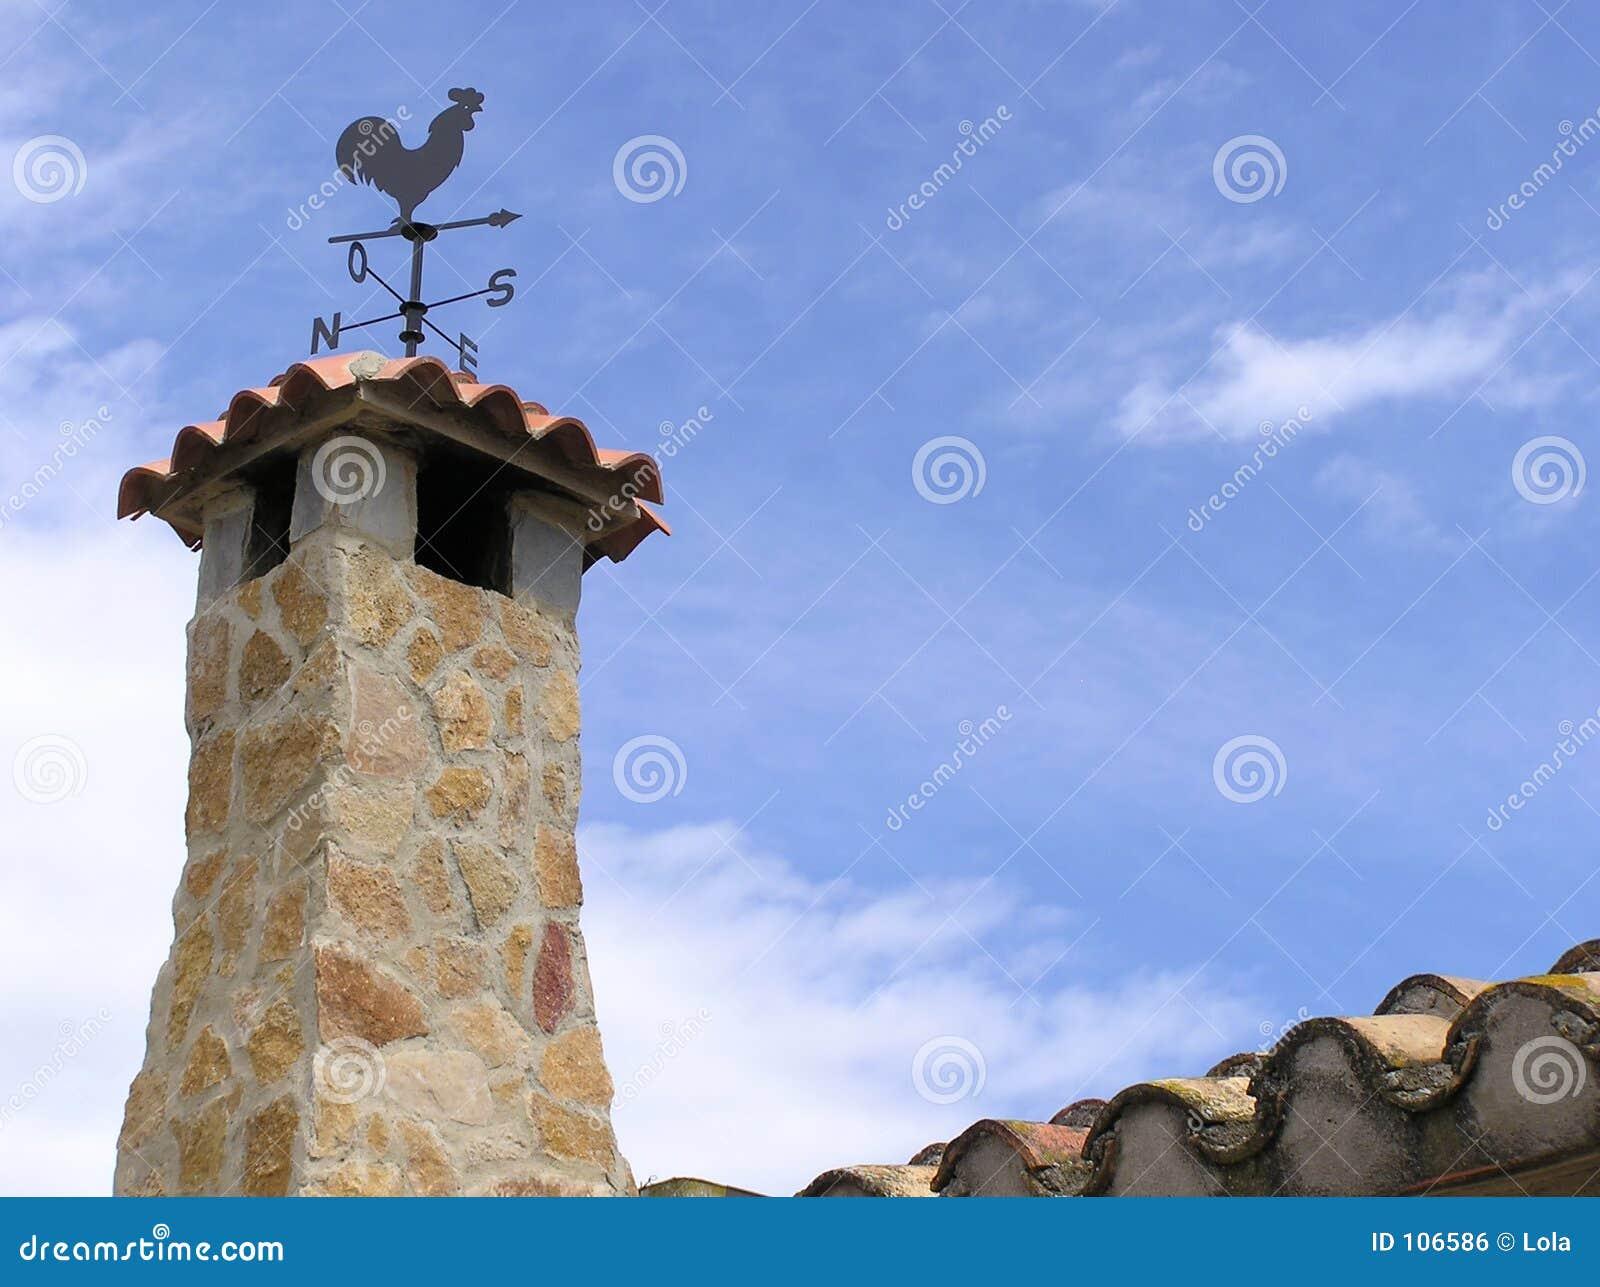 Stoned chimney